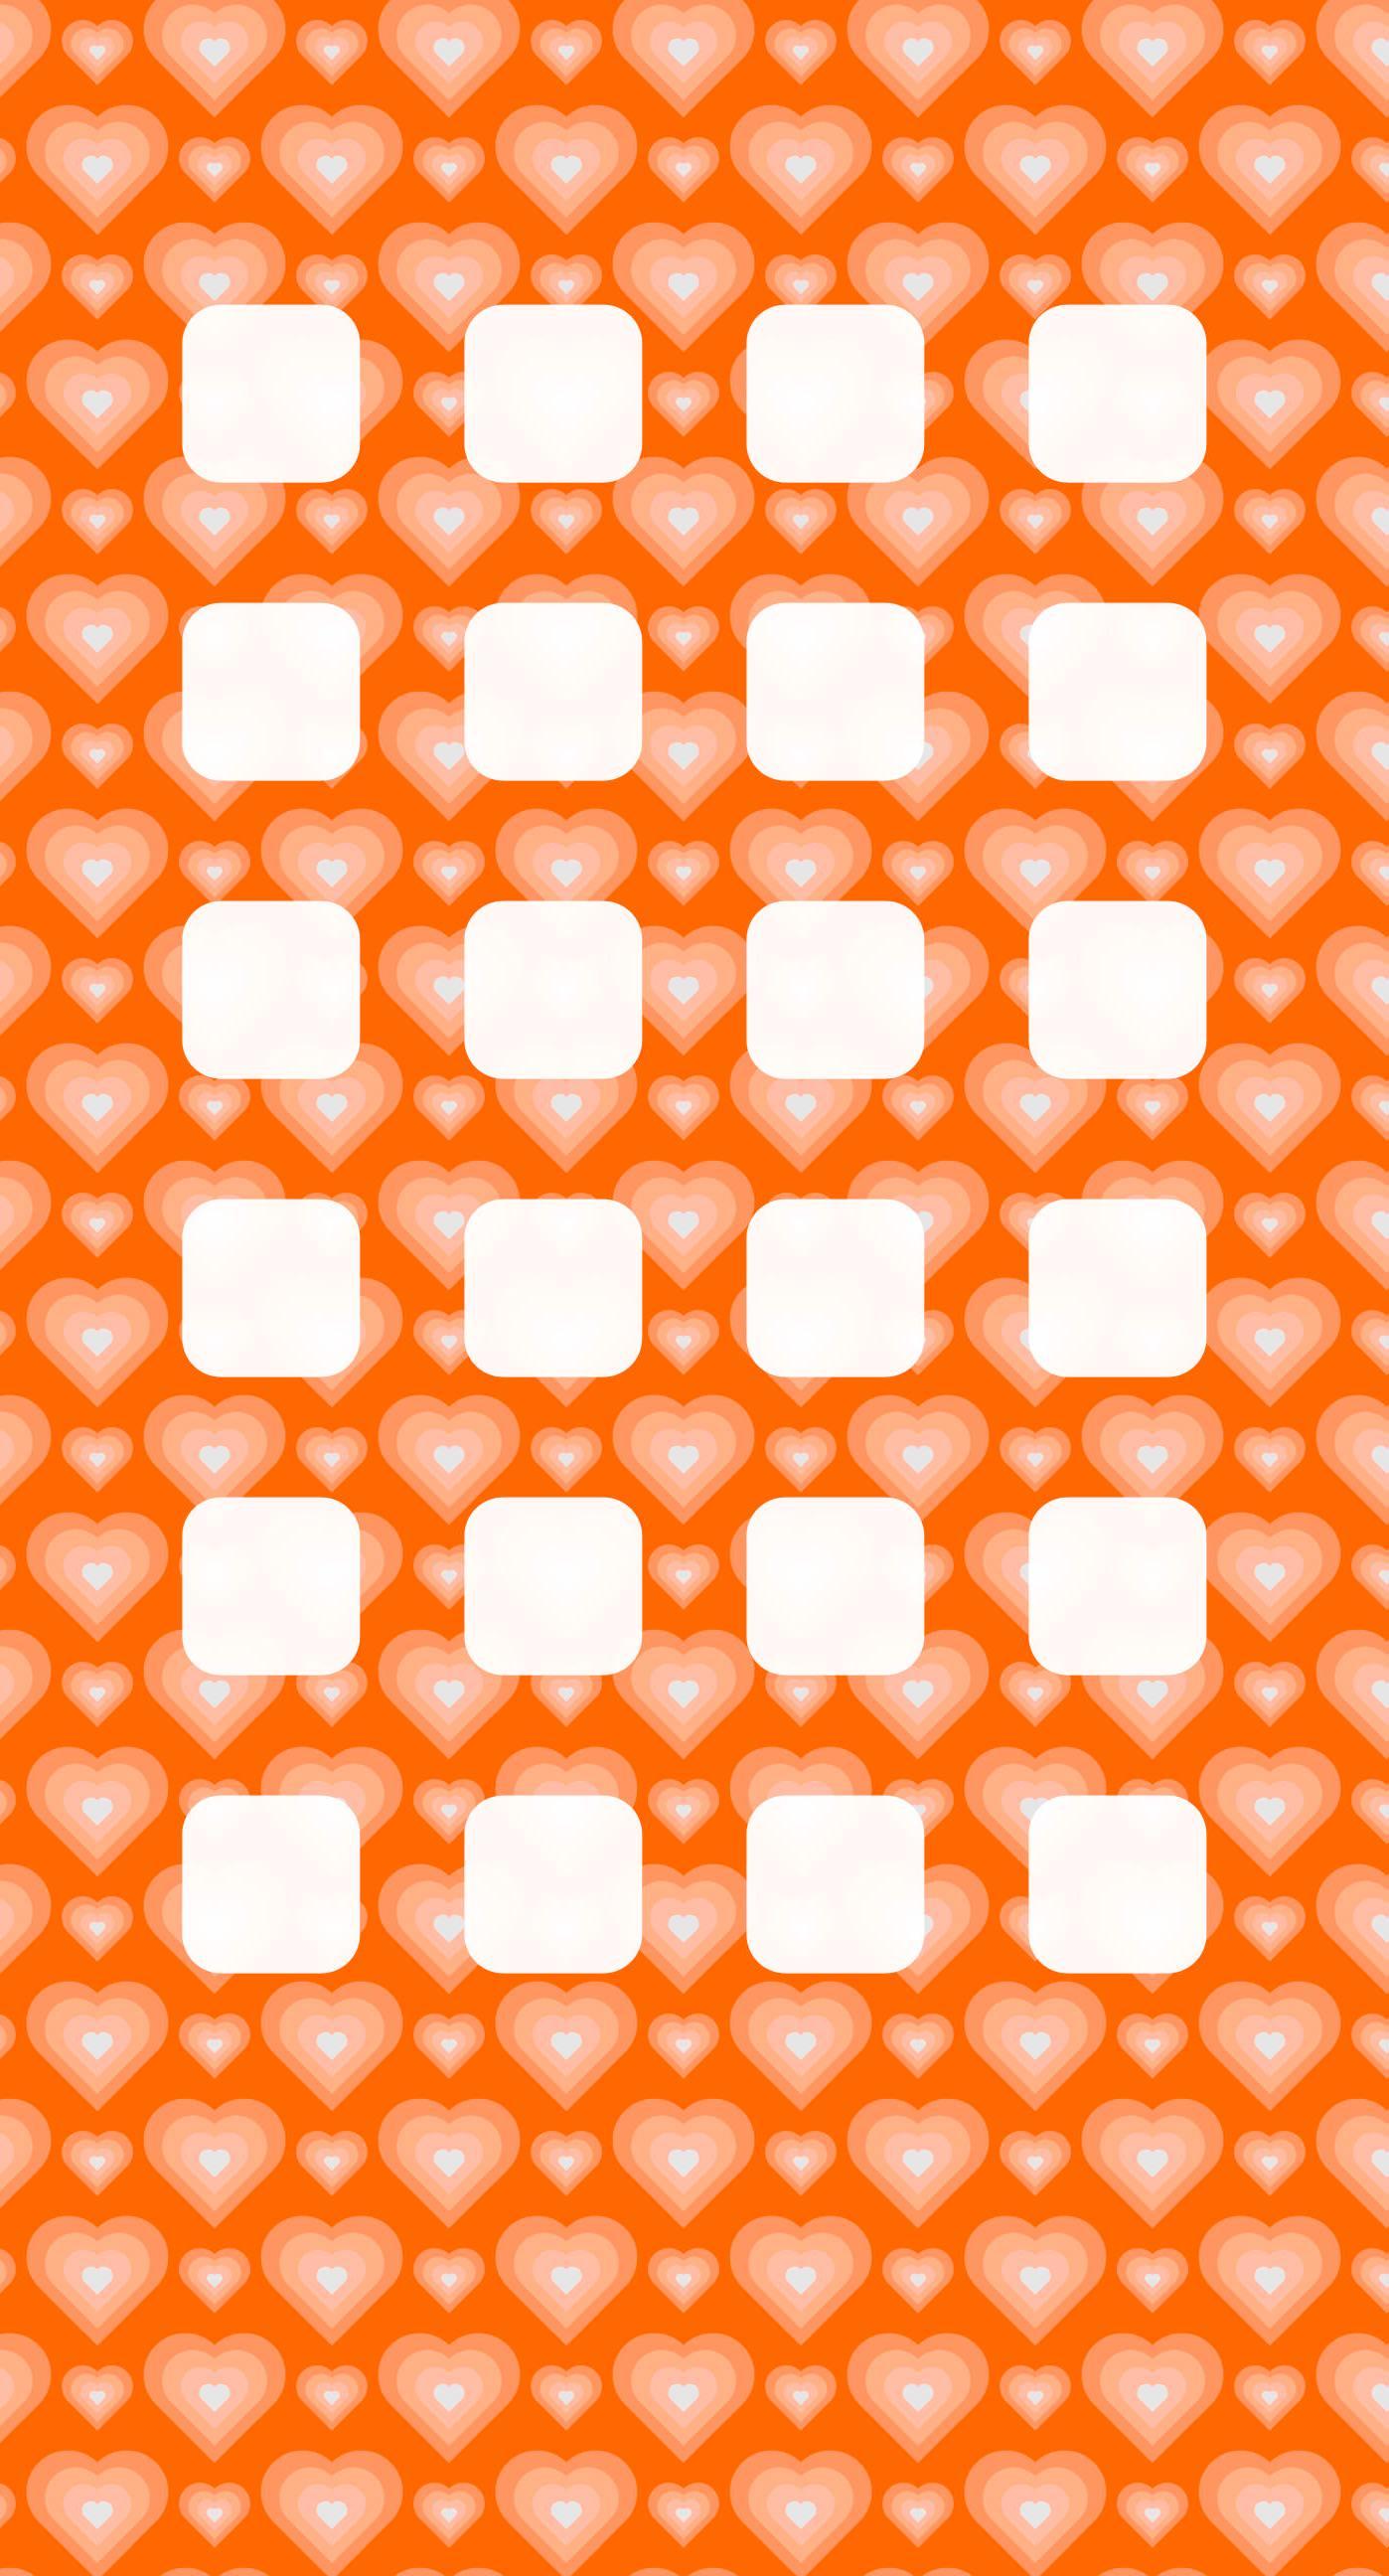 Heart pattern for girls orange shelf wallpapersc iPhone7Plus 1398x2592